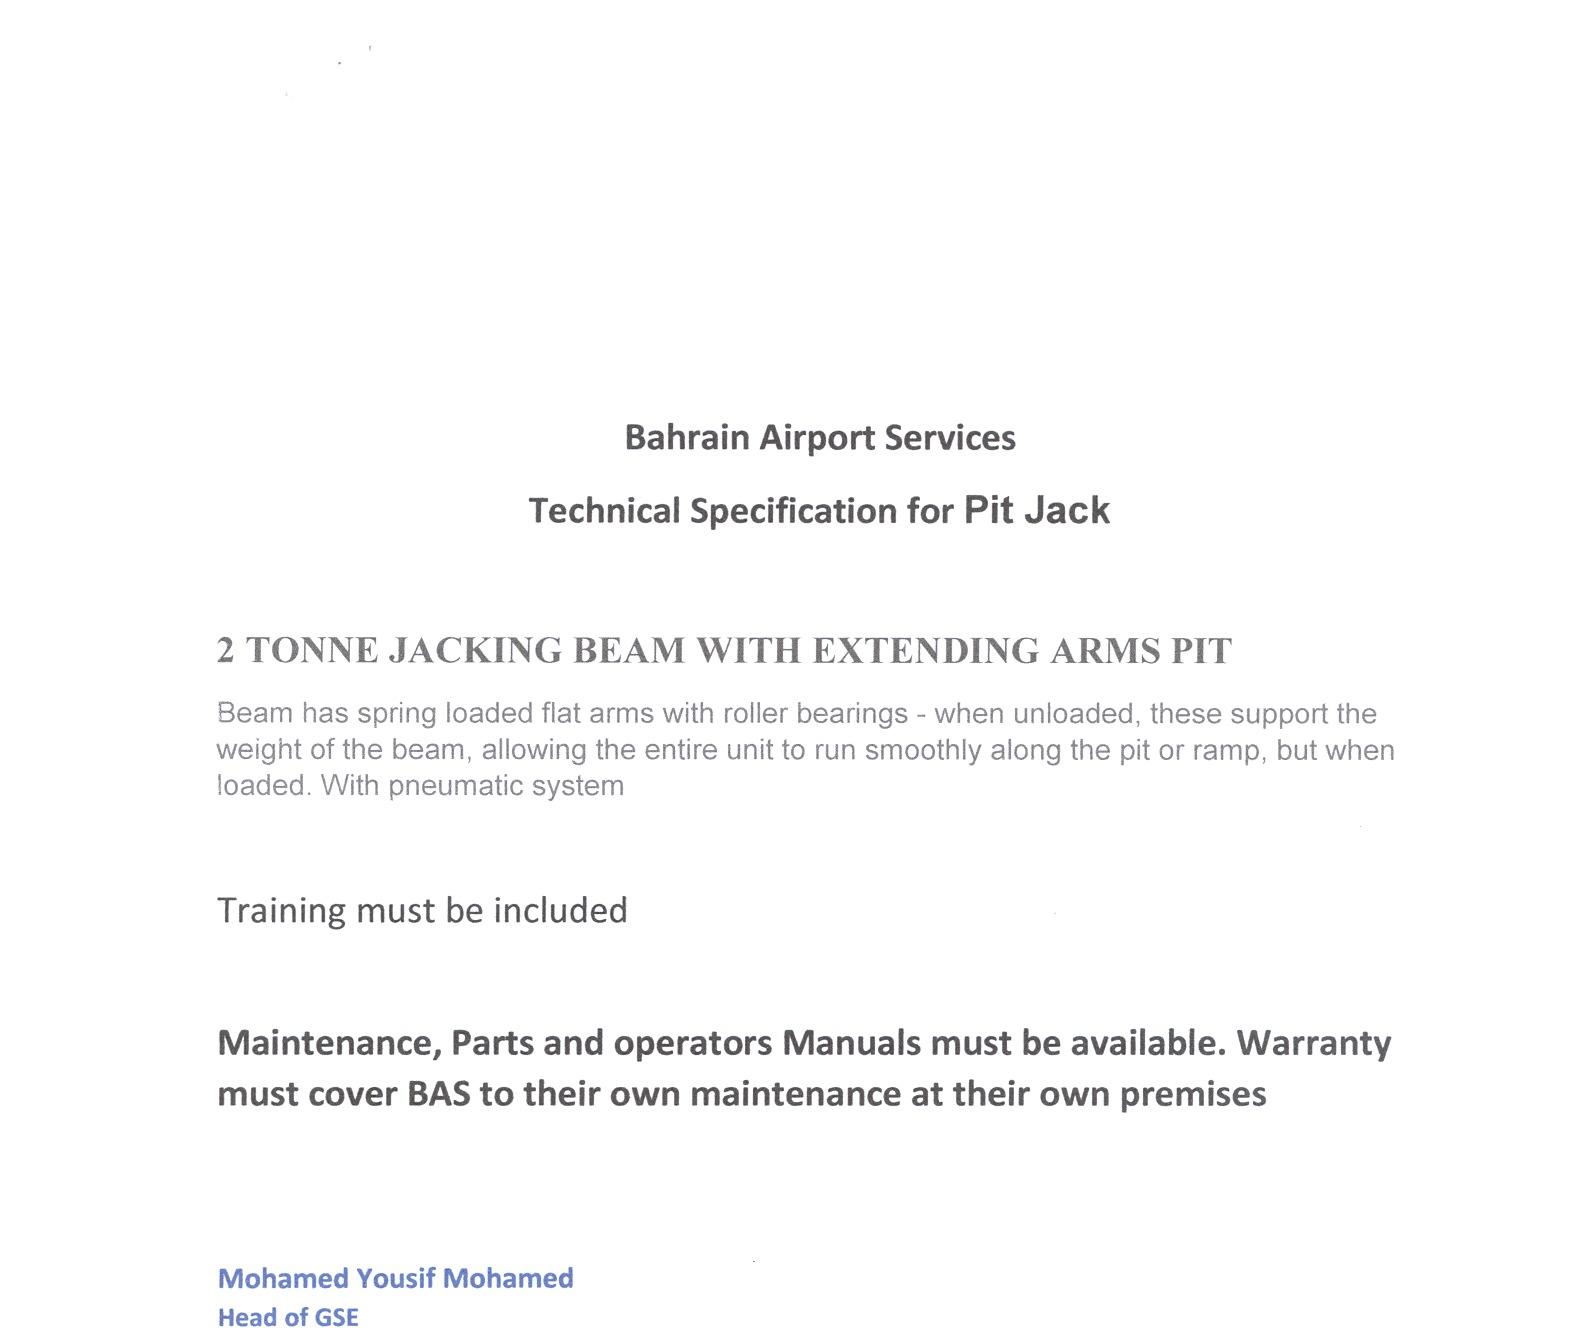 Bahrain Airport Services Open Tender Document - Bahrain